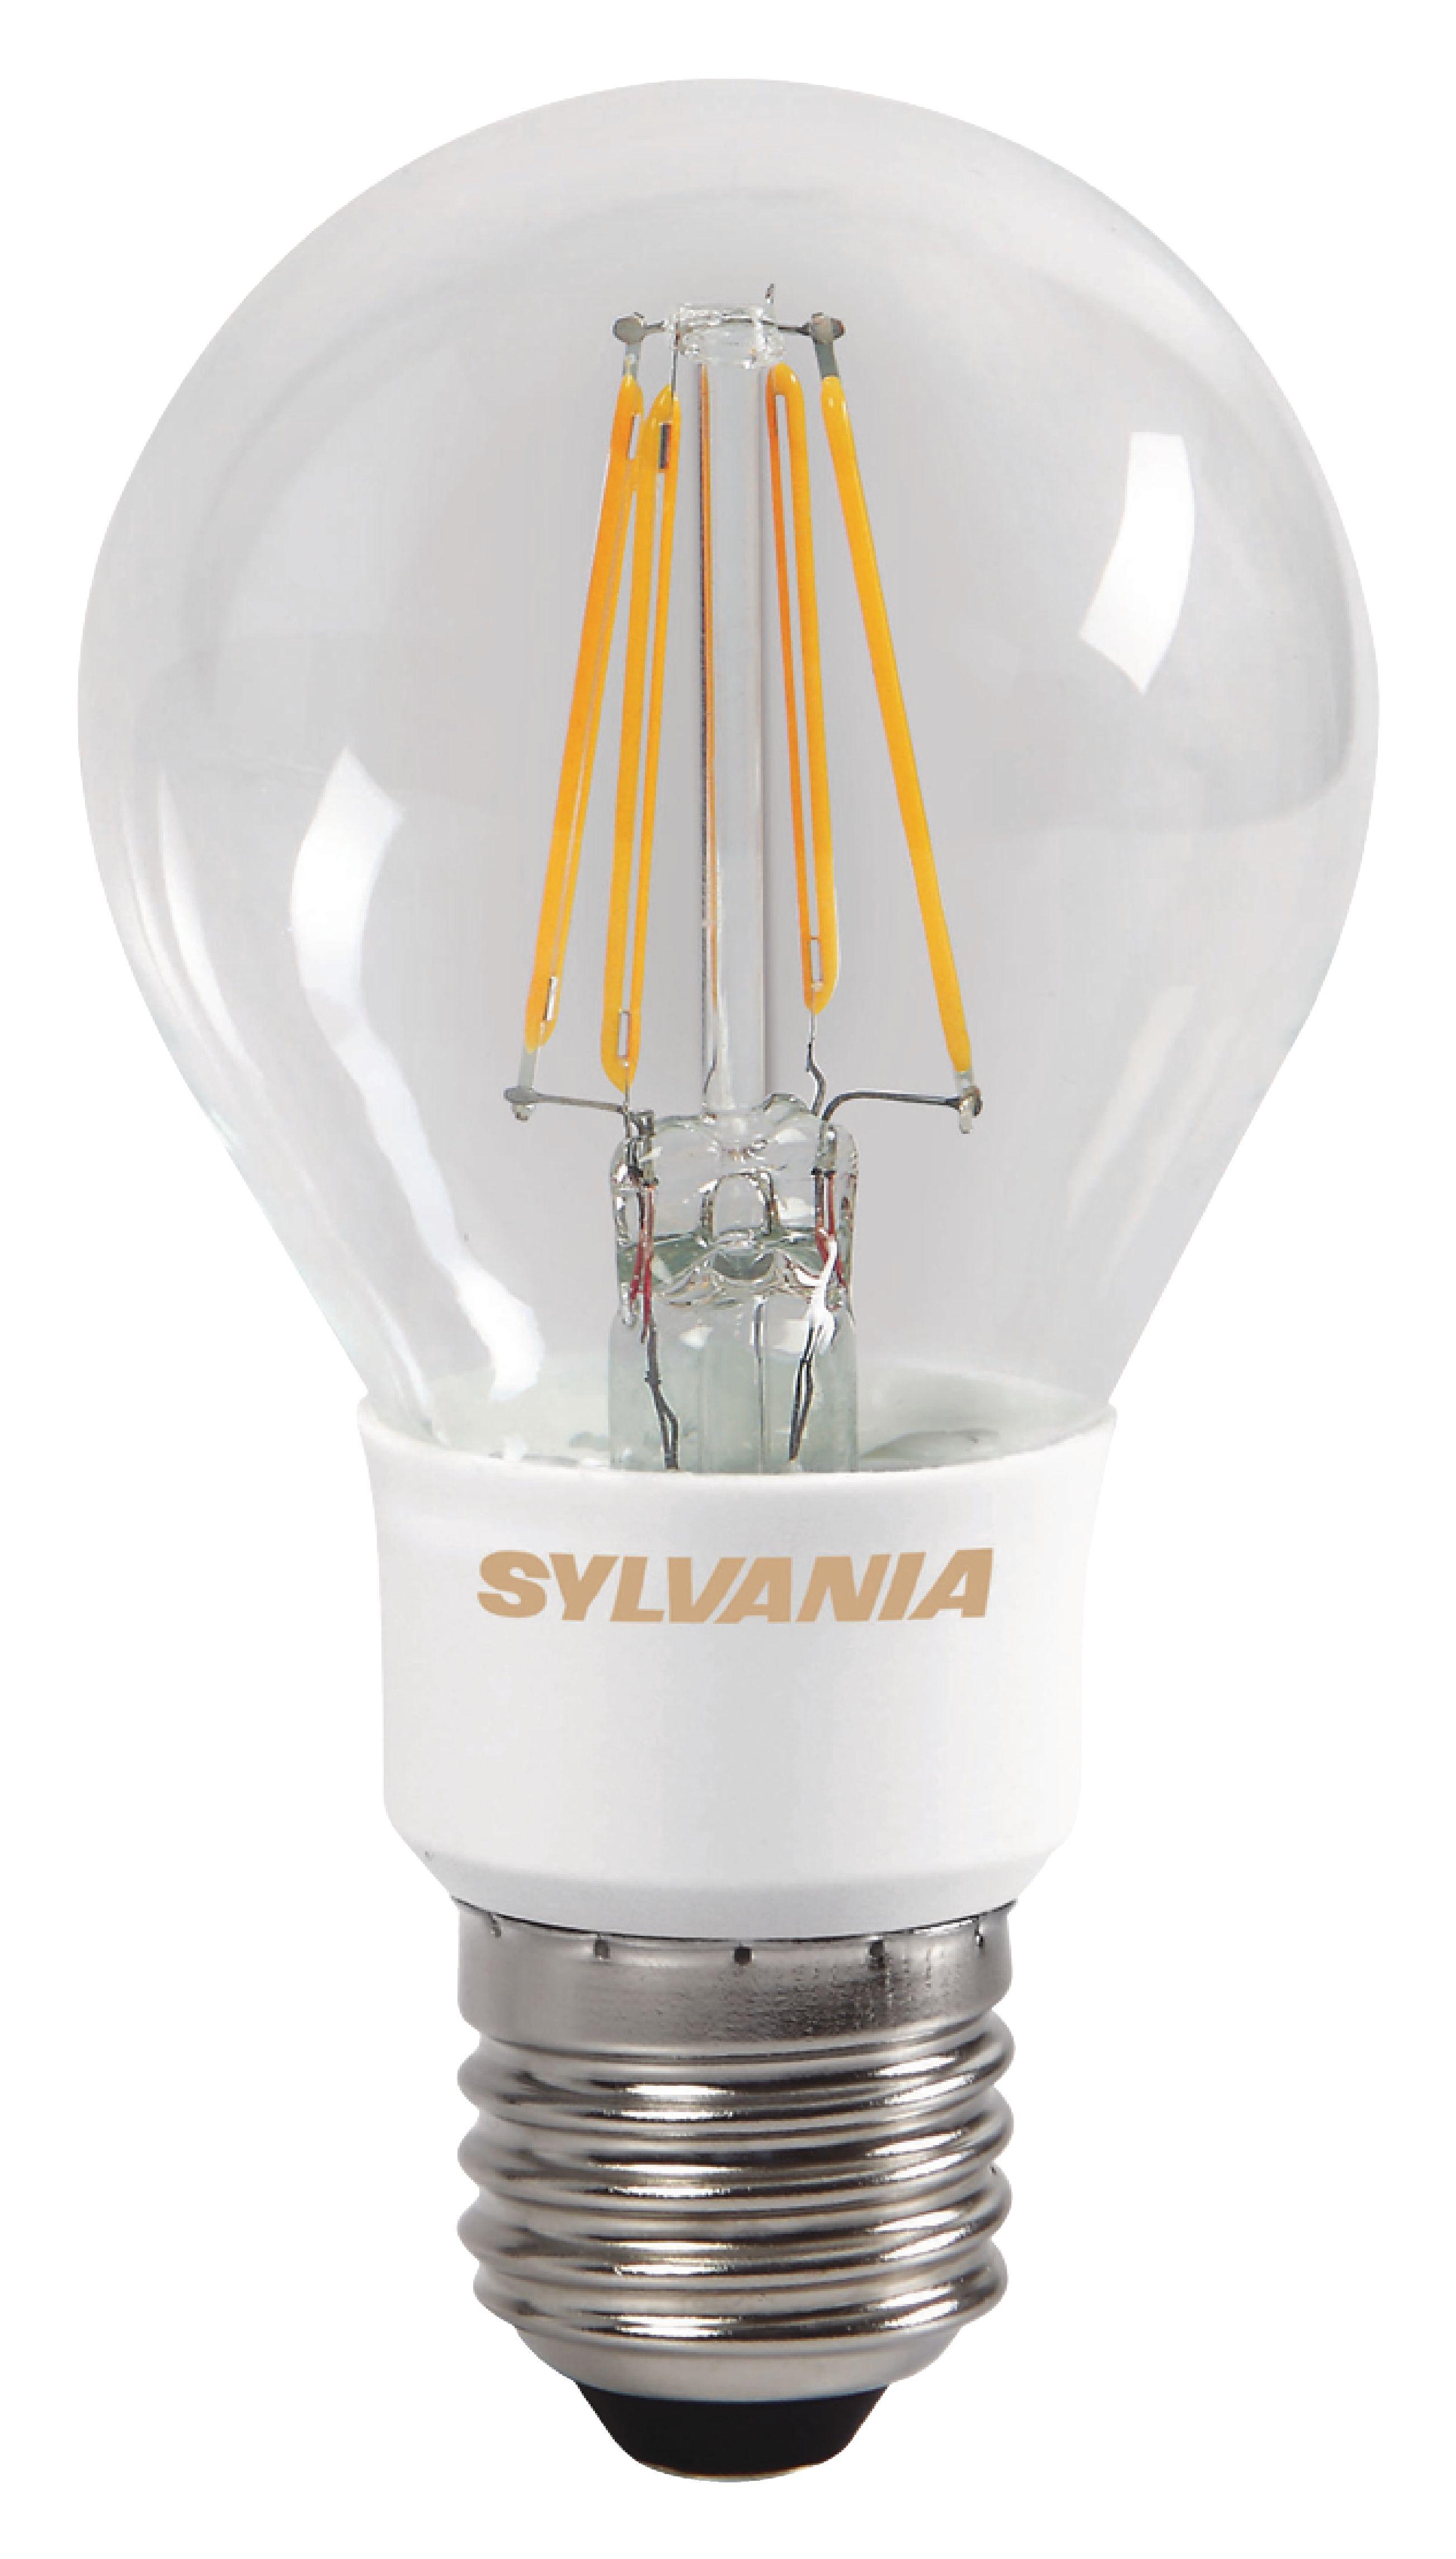 syl 0027125 sylvania led retro filament lamp e27 dimmable gls 5 5 w 640 lm 2700 k. Black Bedroom Furniture Sets. Home Design Ideas